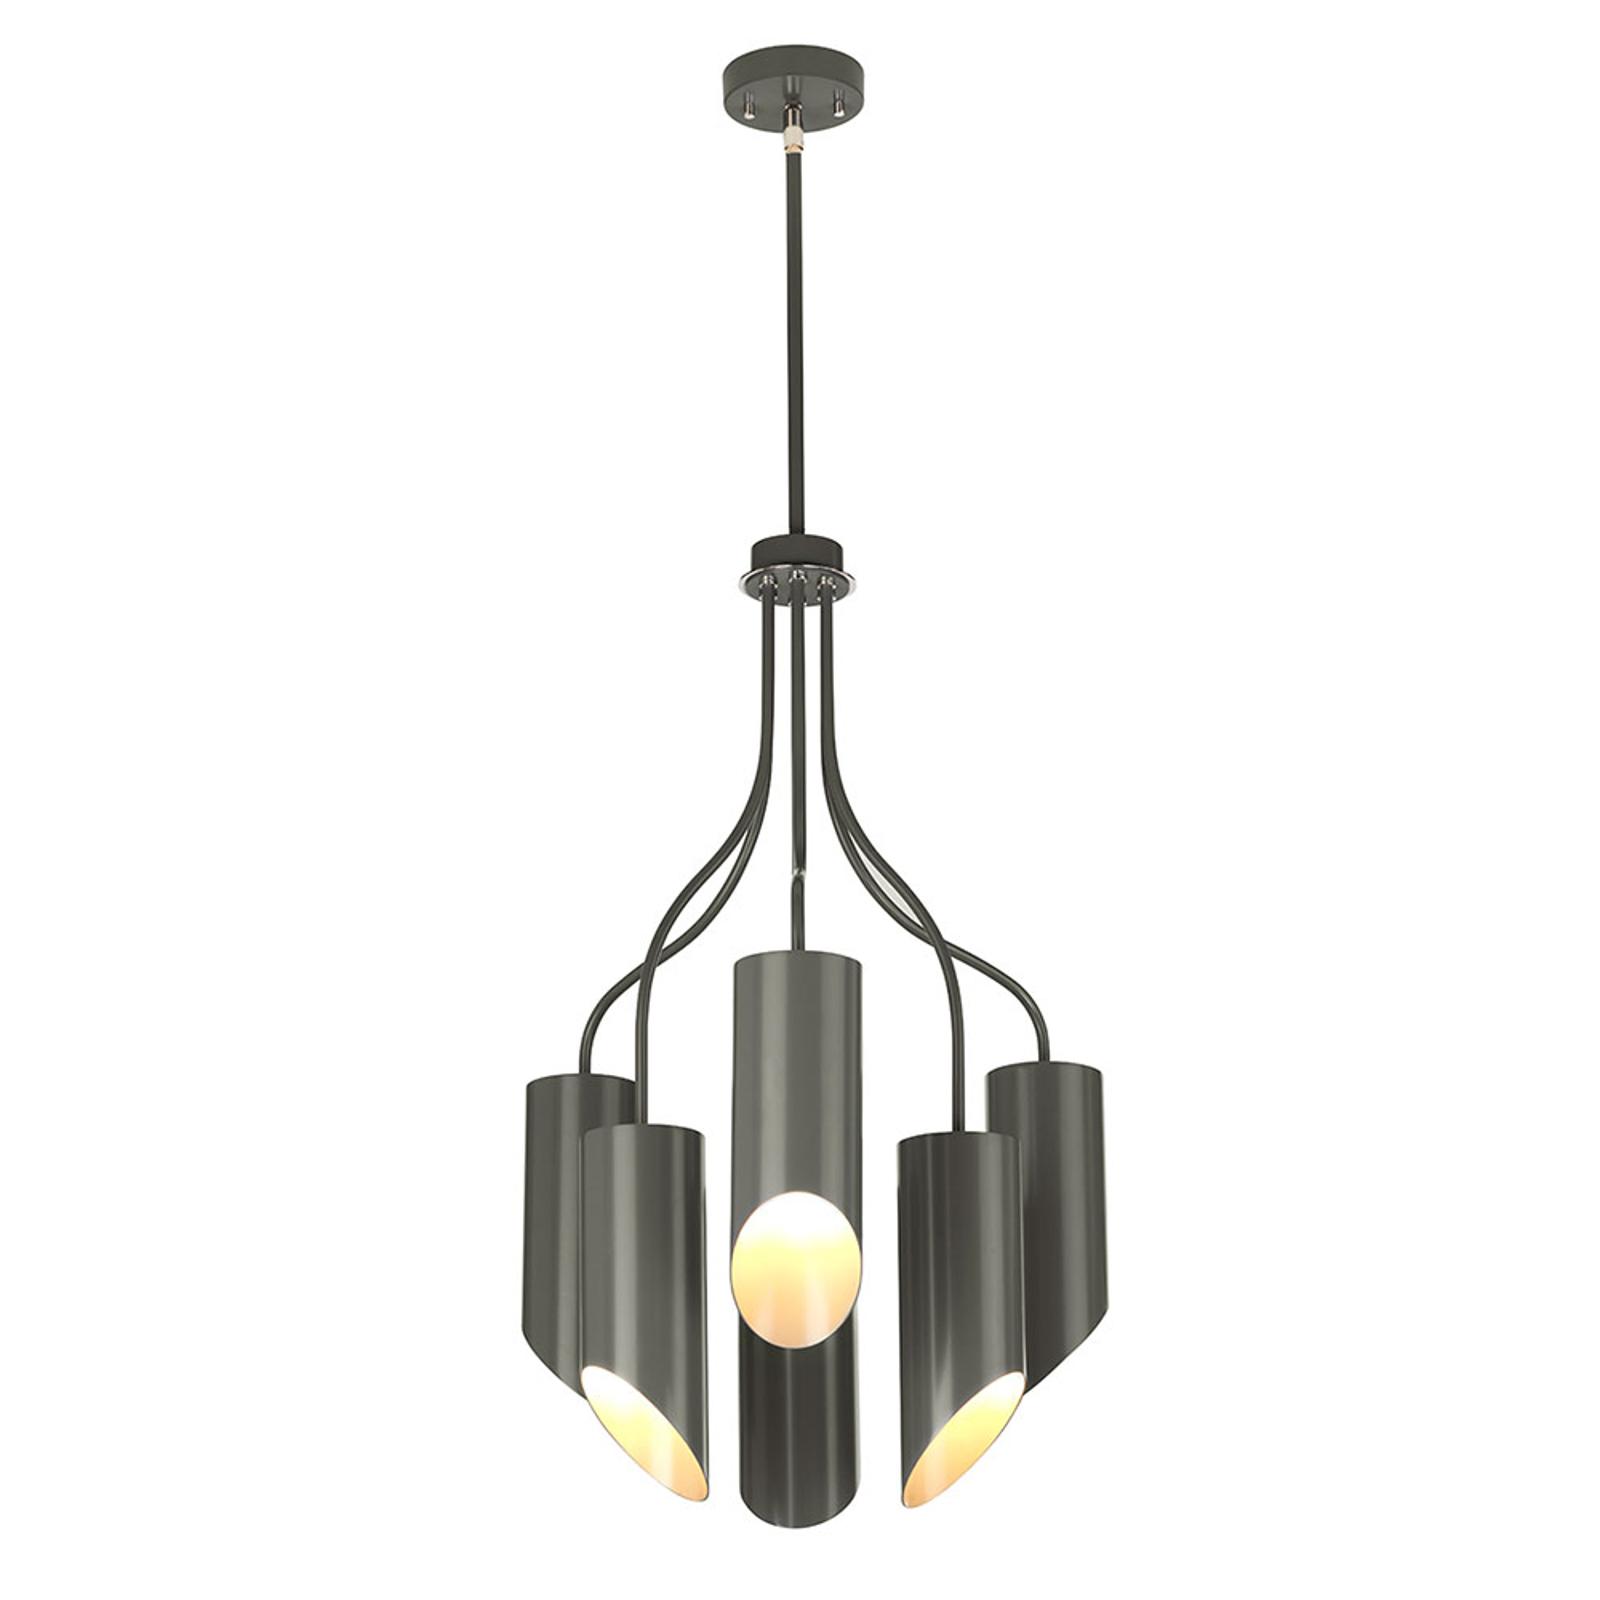 Hanglamp Quinto 6-lamps, donkergrijs/nikkel